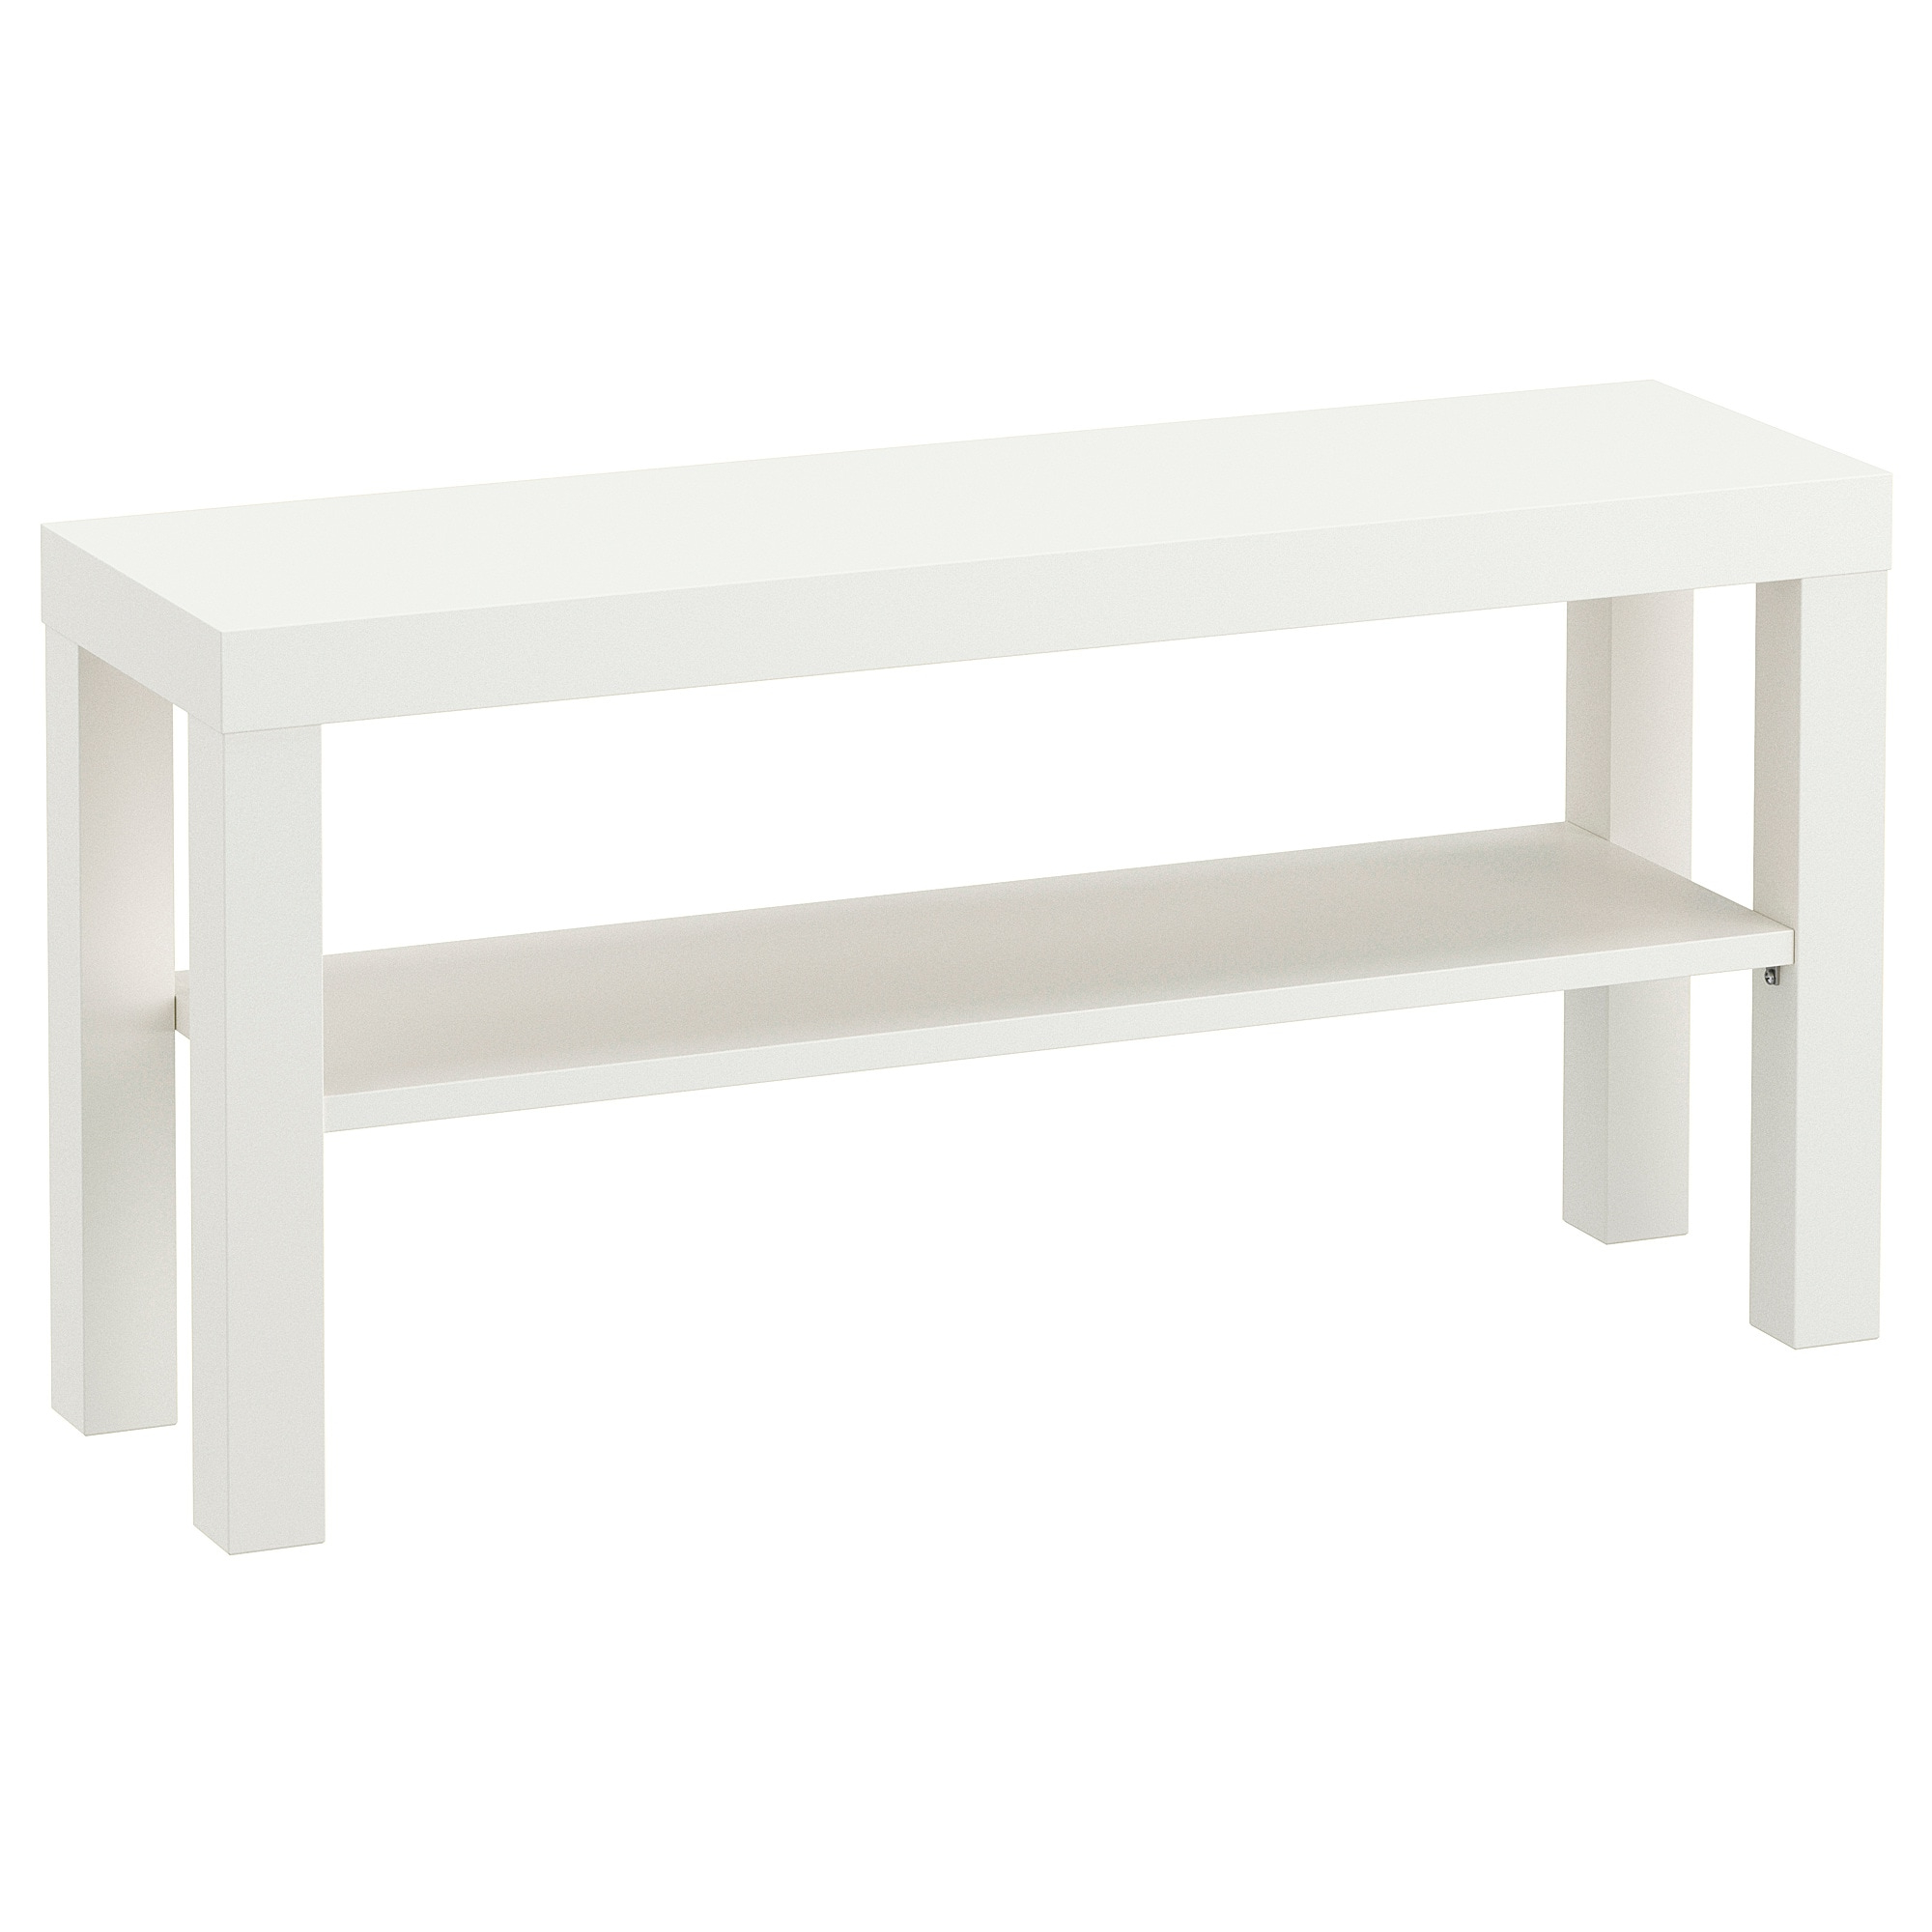 Mueble Tv Esquinero D0dg Muebles De Tv Y Muebles Para El Salà N Pra Online Ikea